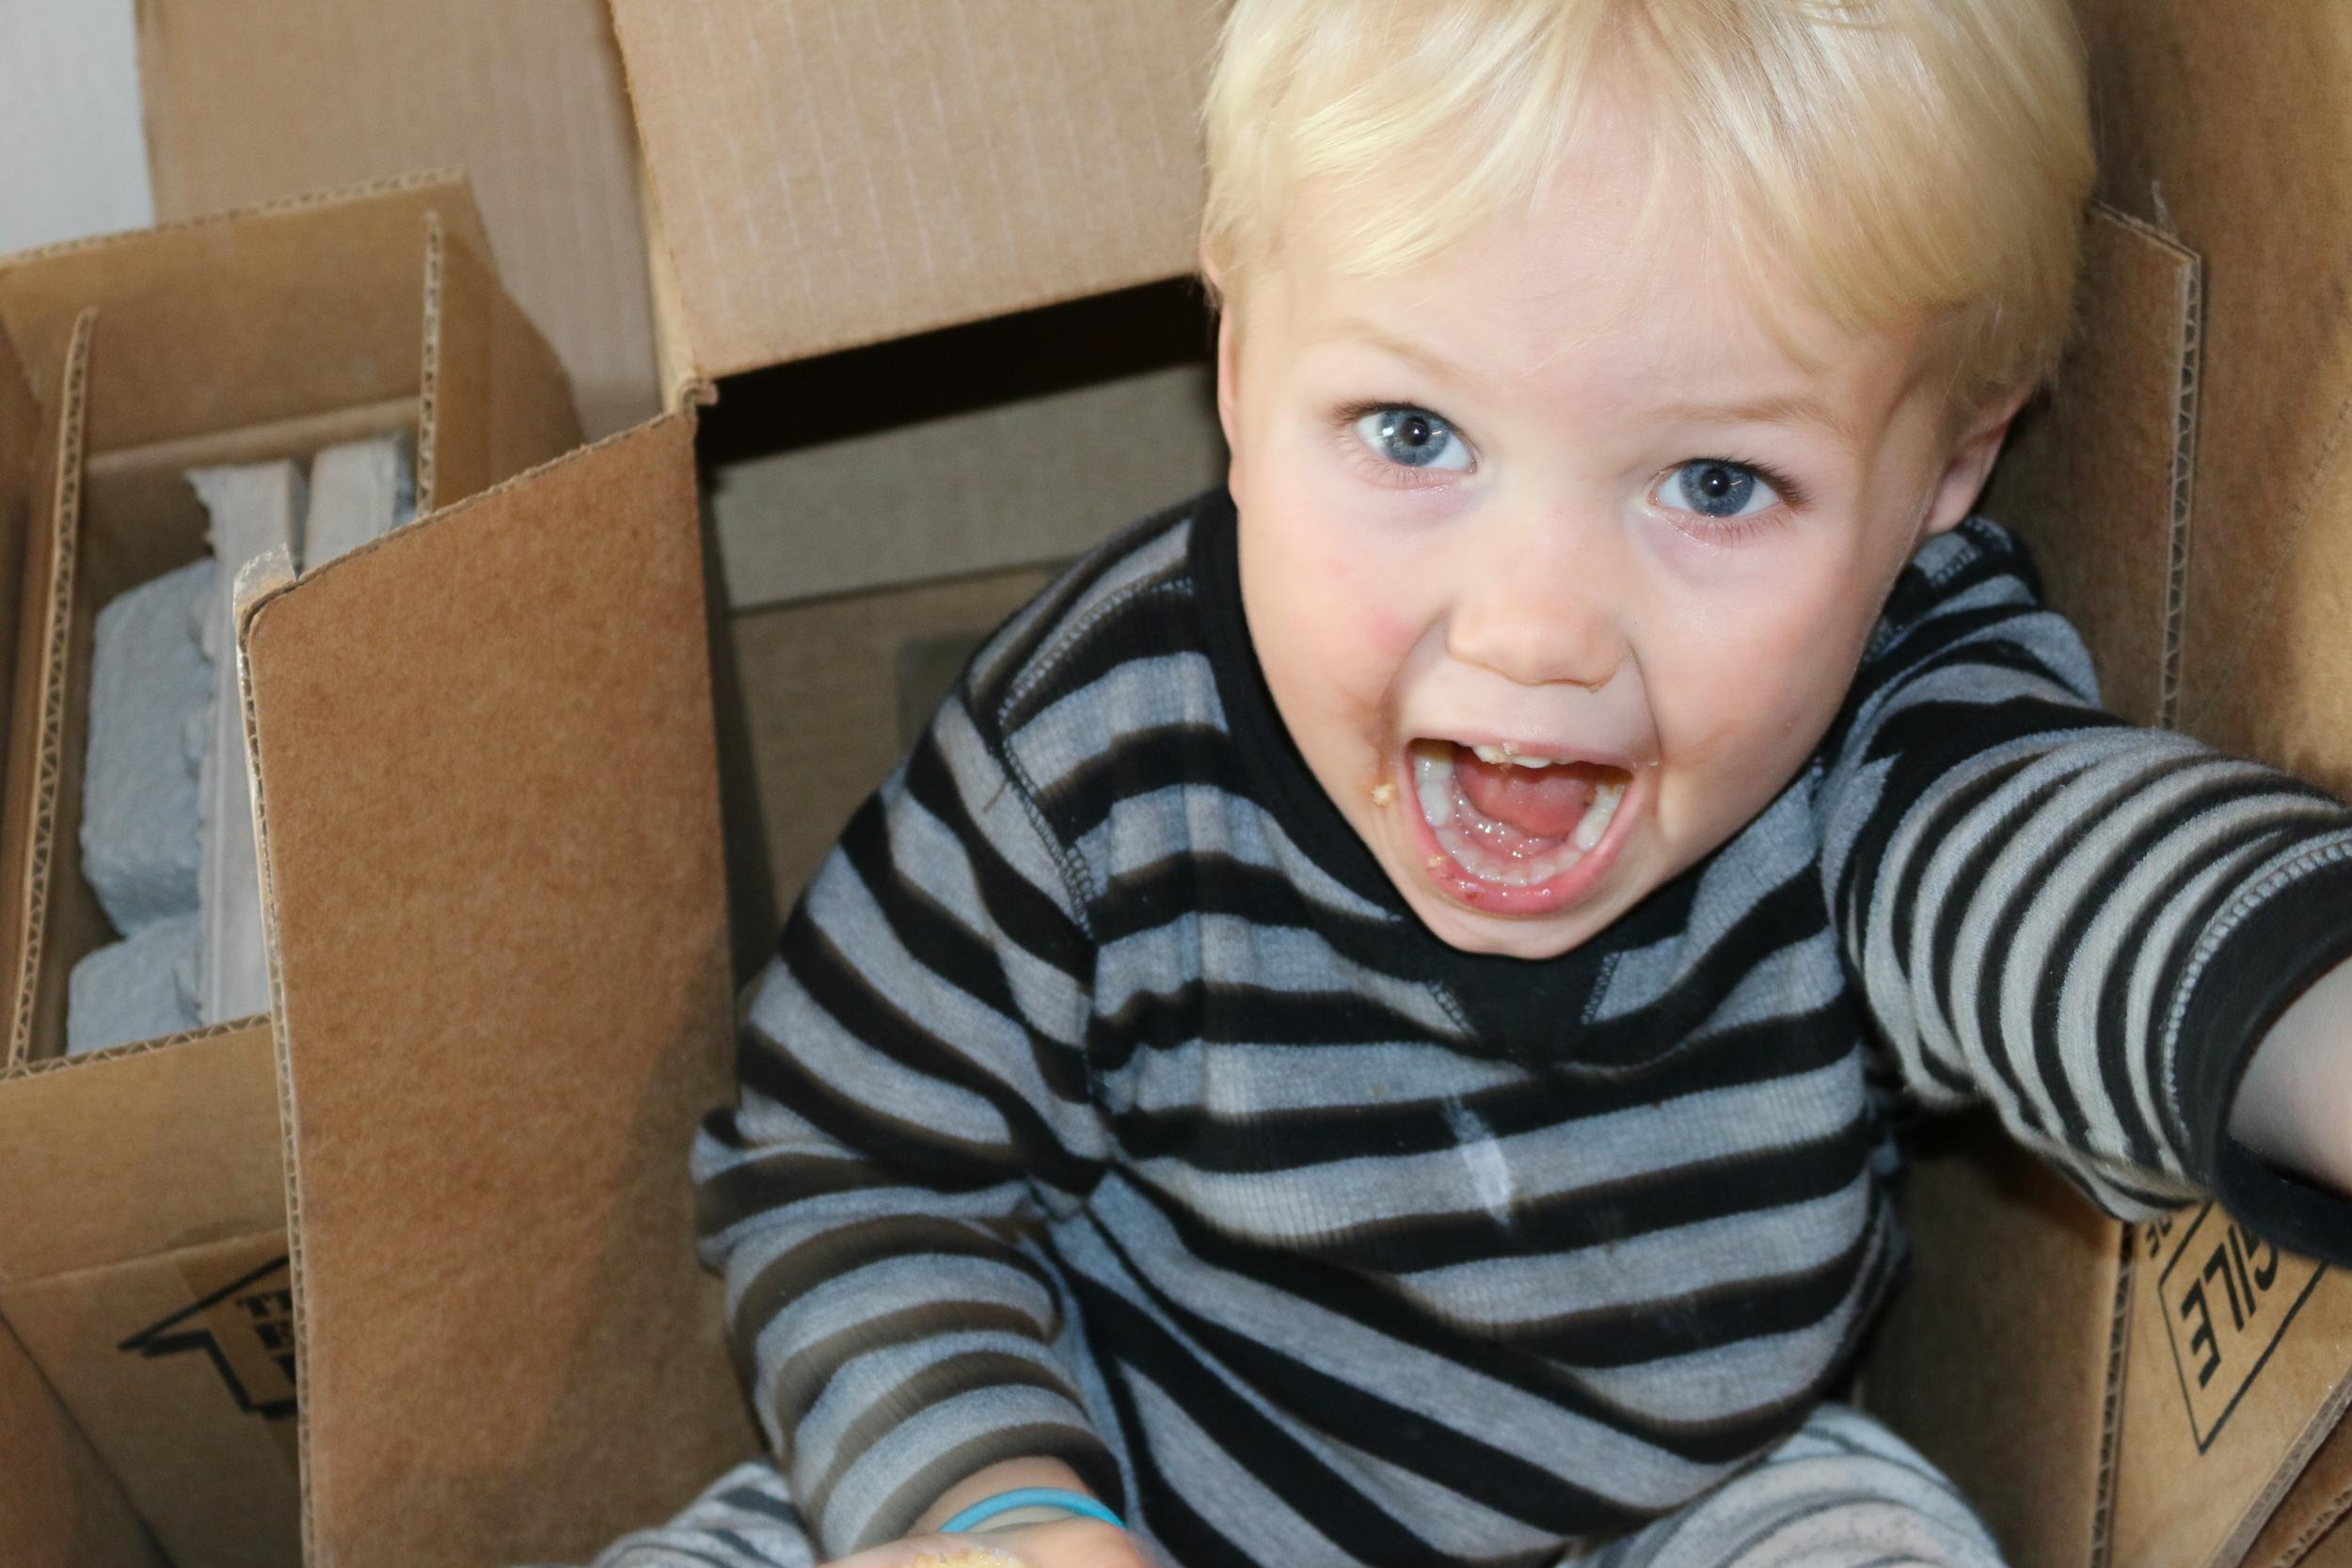 A boy in a box!